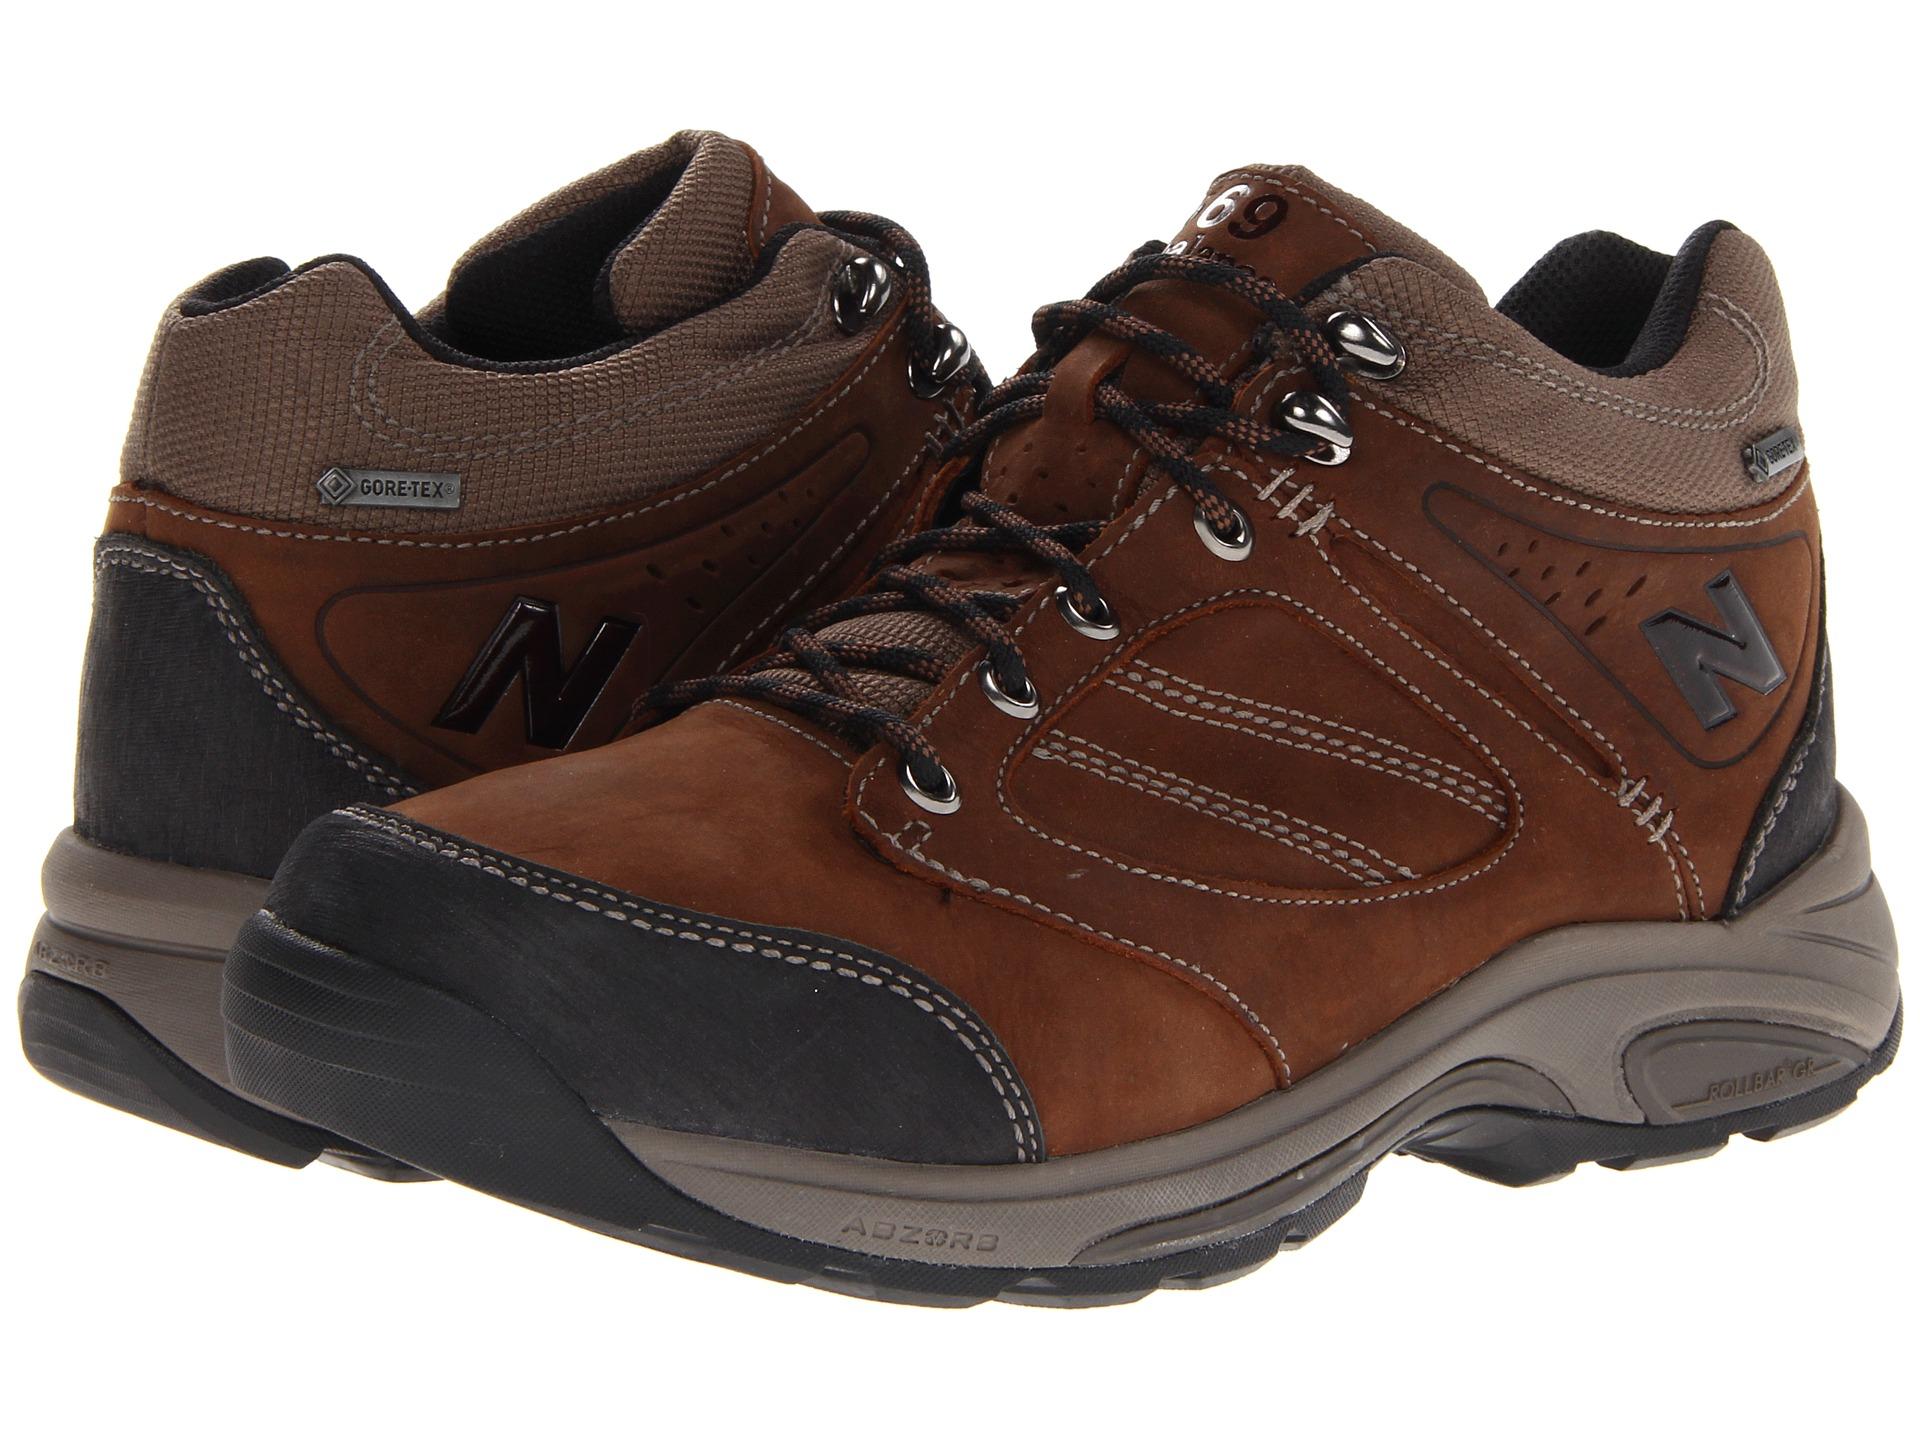 Original New Balance 1201 GoreTex XCR Hiking Boots  Waterproof For Women